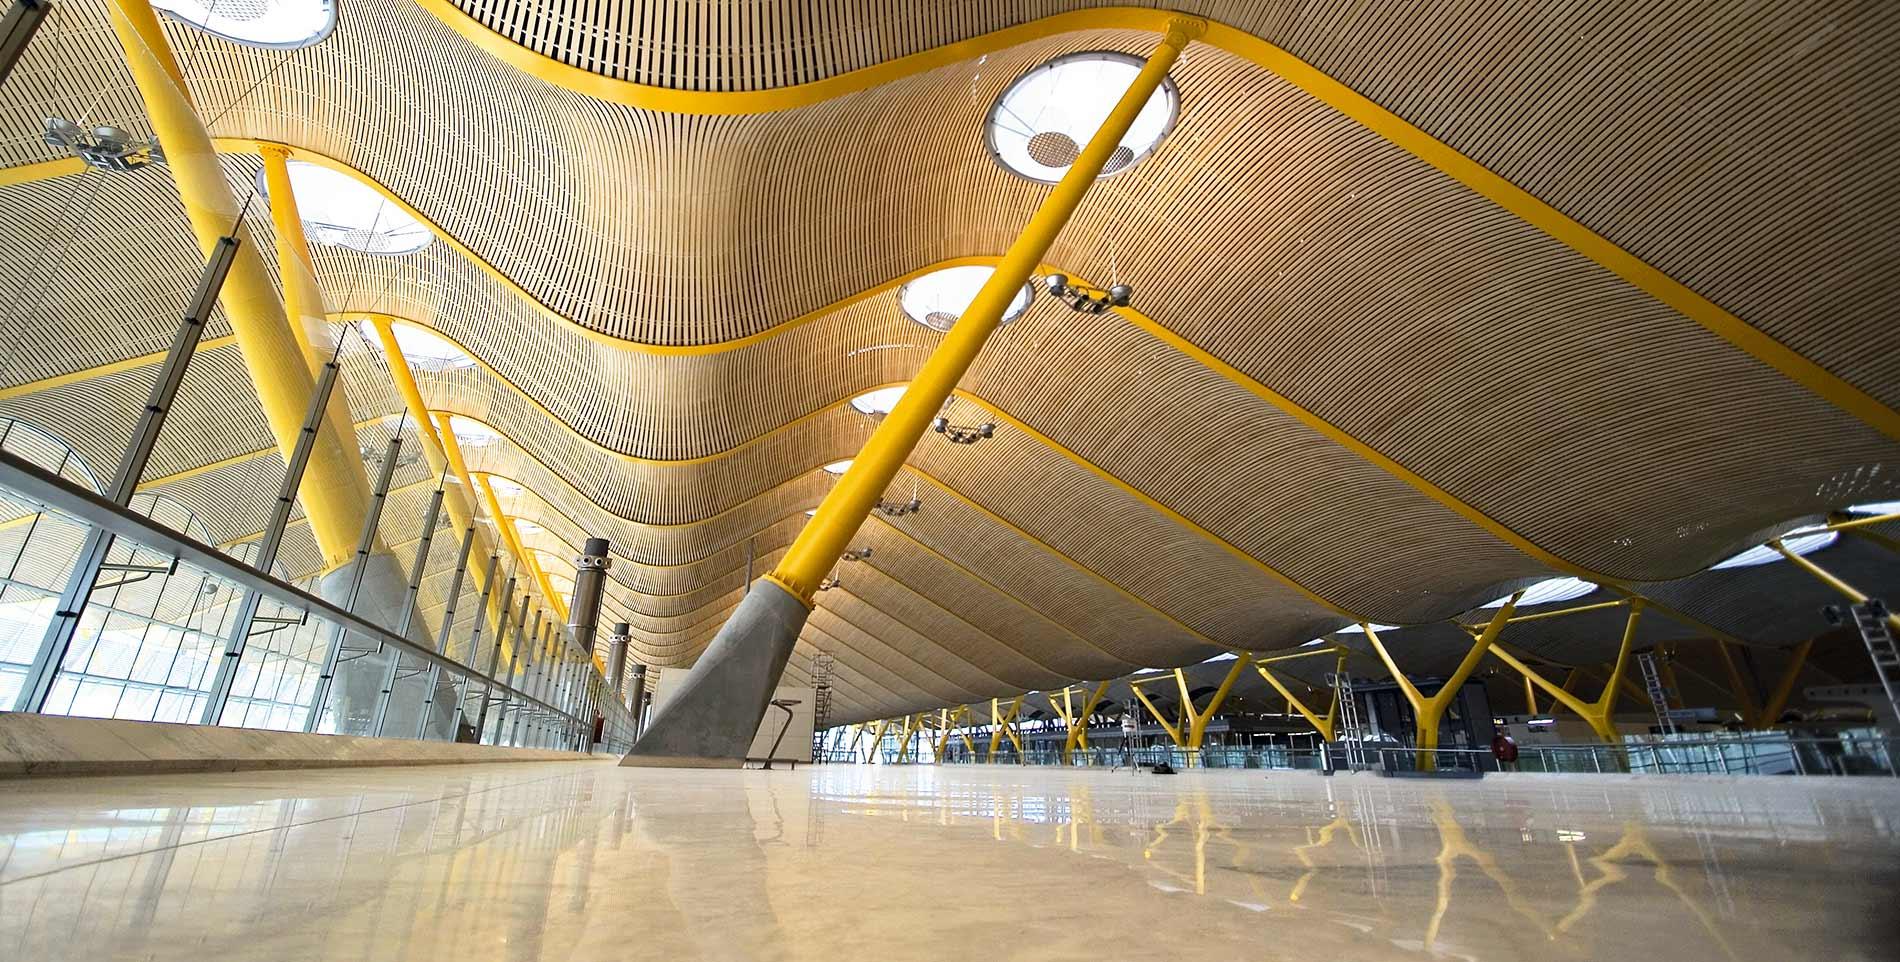 Terminal 4 aeropuerto adolfo su rez madrid barajas - Terminal ejecutiva barajas ...